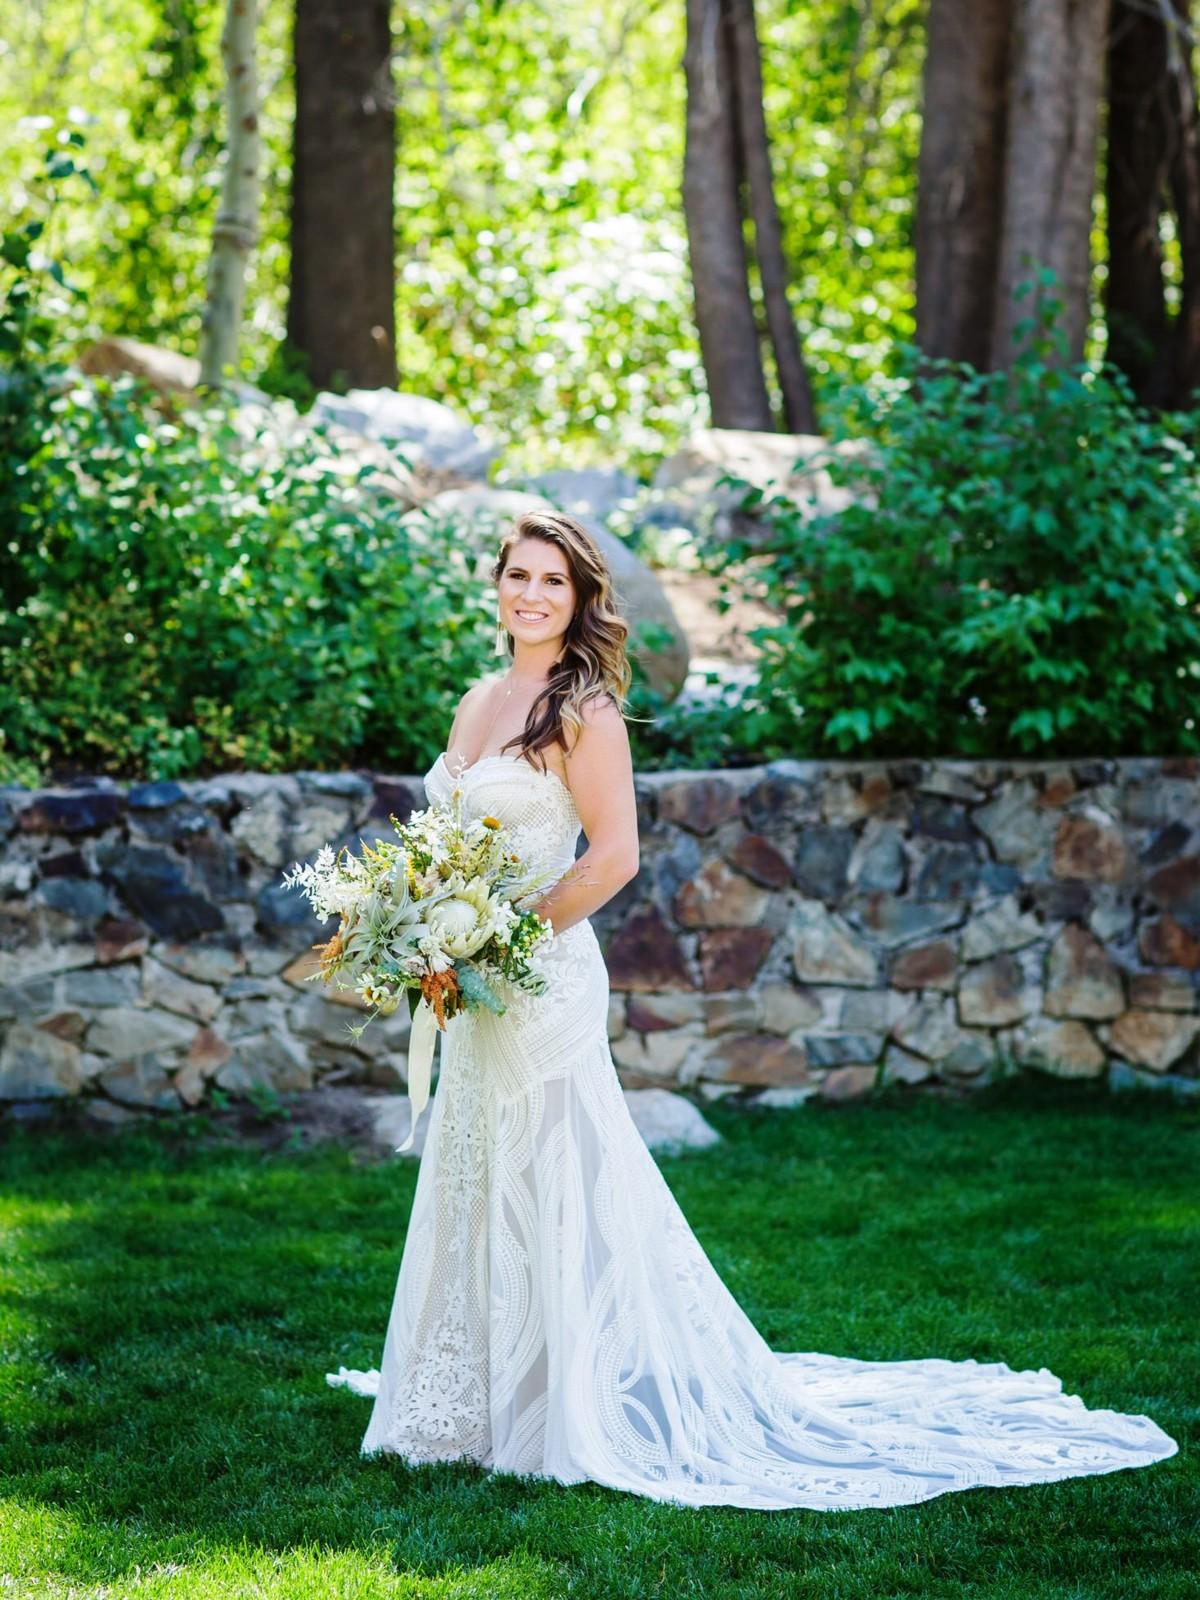 Nancy Rice Artistry - Lake Tahoe wedding hair & makeup - bride ready for ceremony